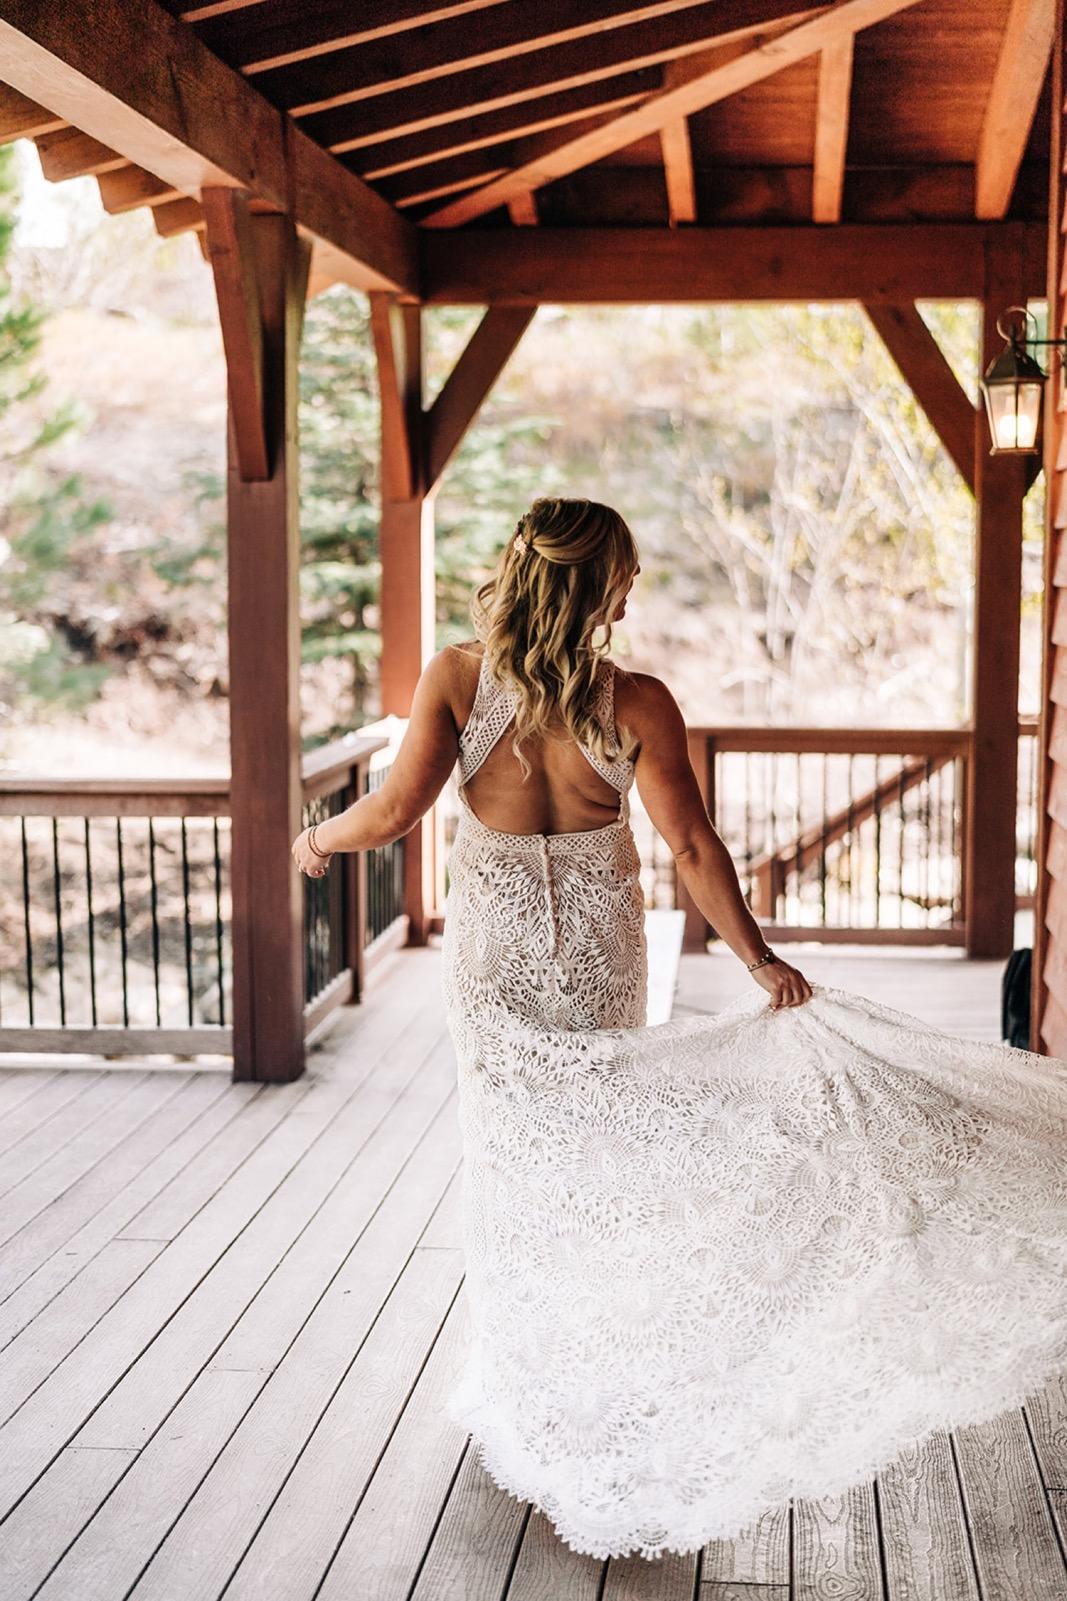 128_falissa_heather_wedding-398.jpg